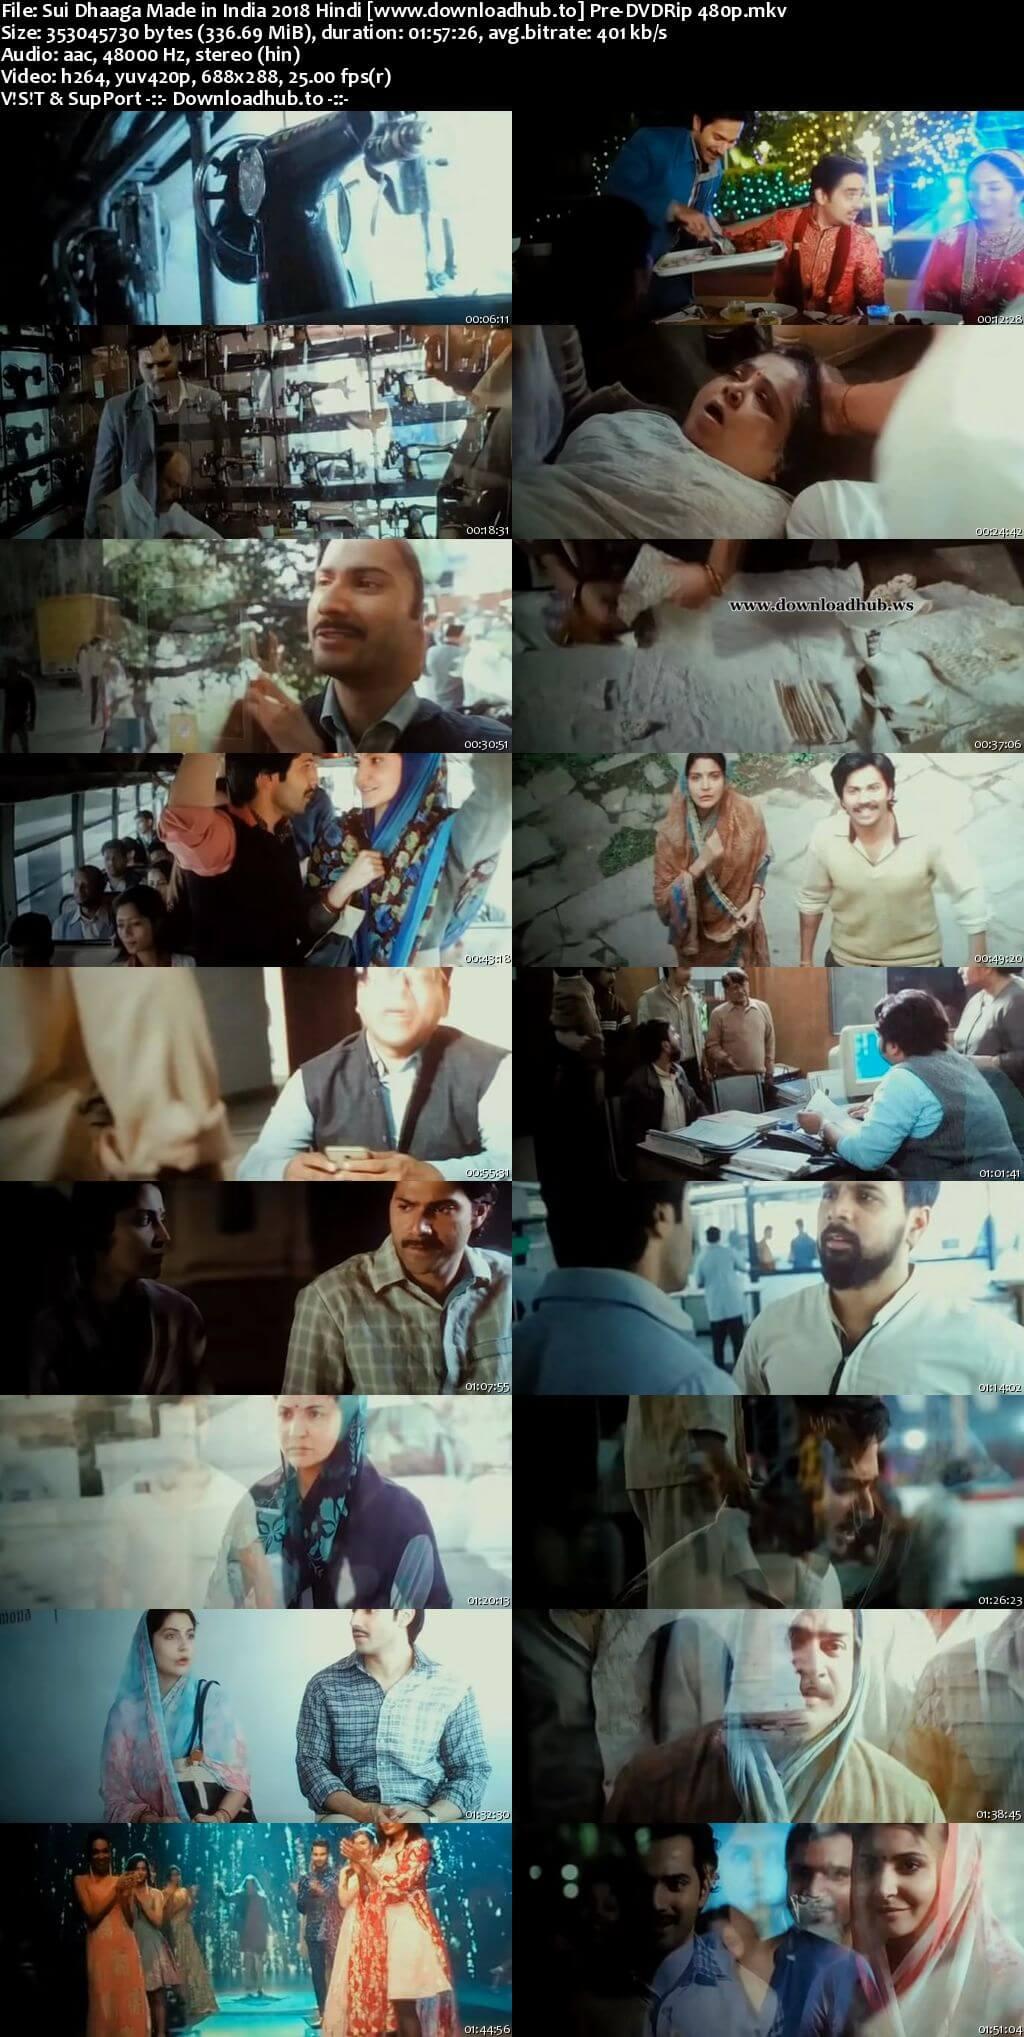 Sui Dhaaga 2018 Hindi 300MB Pre-DVDRip 480p